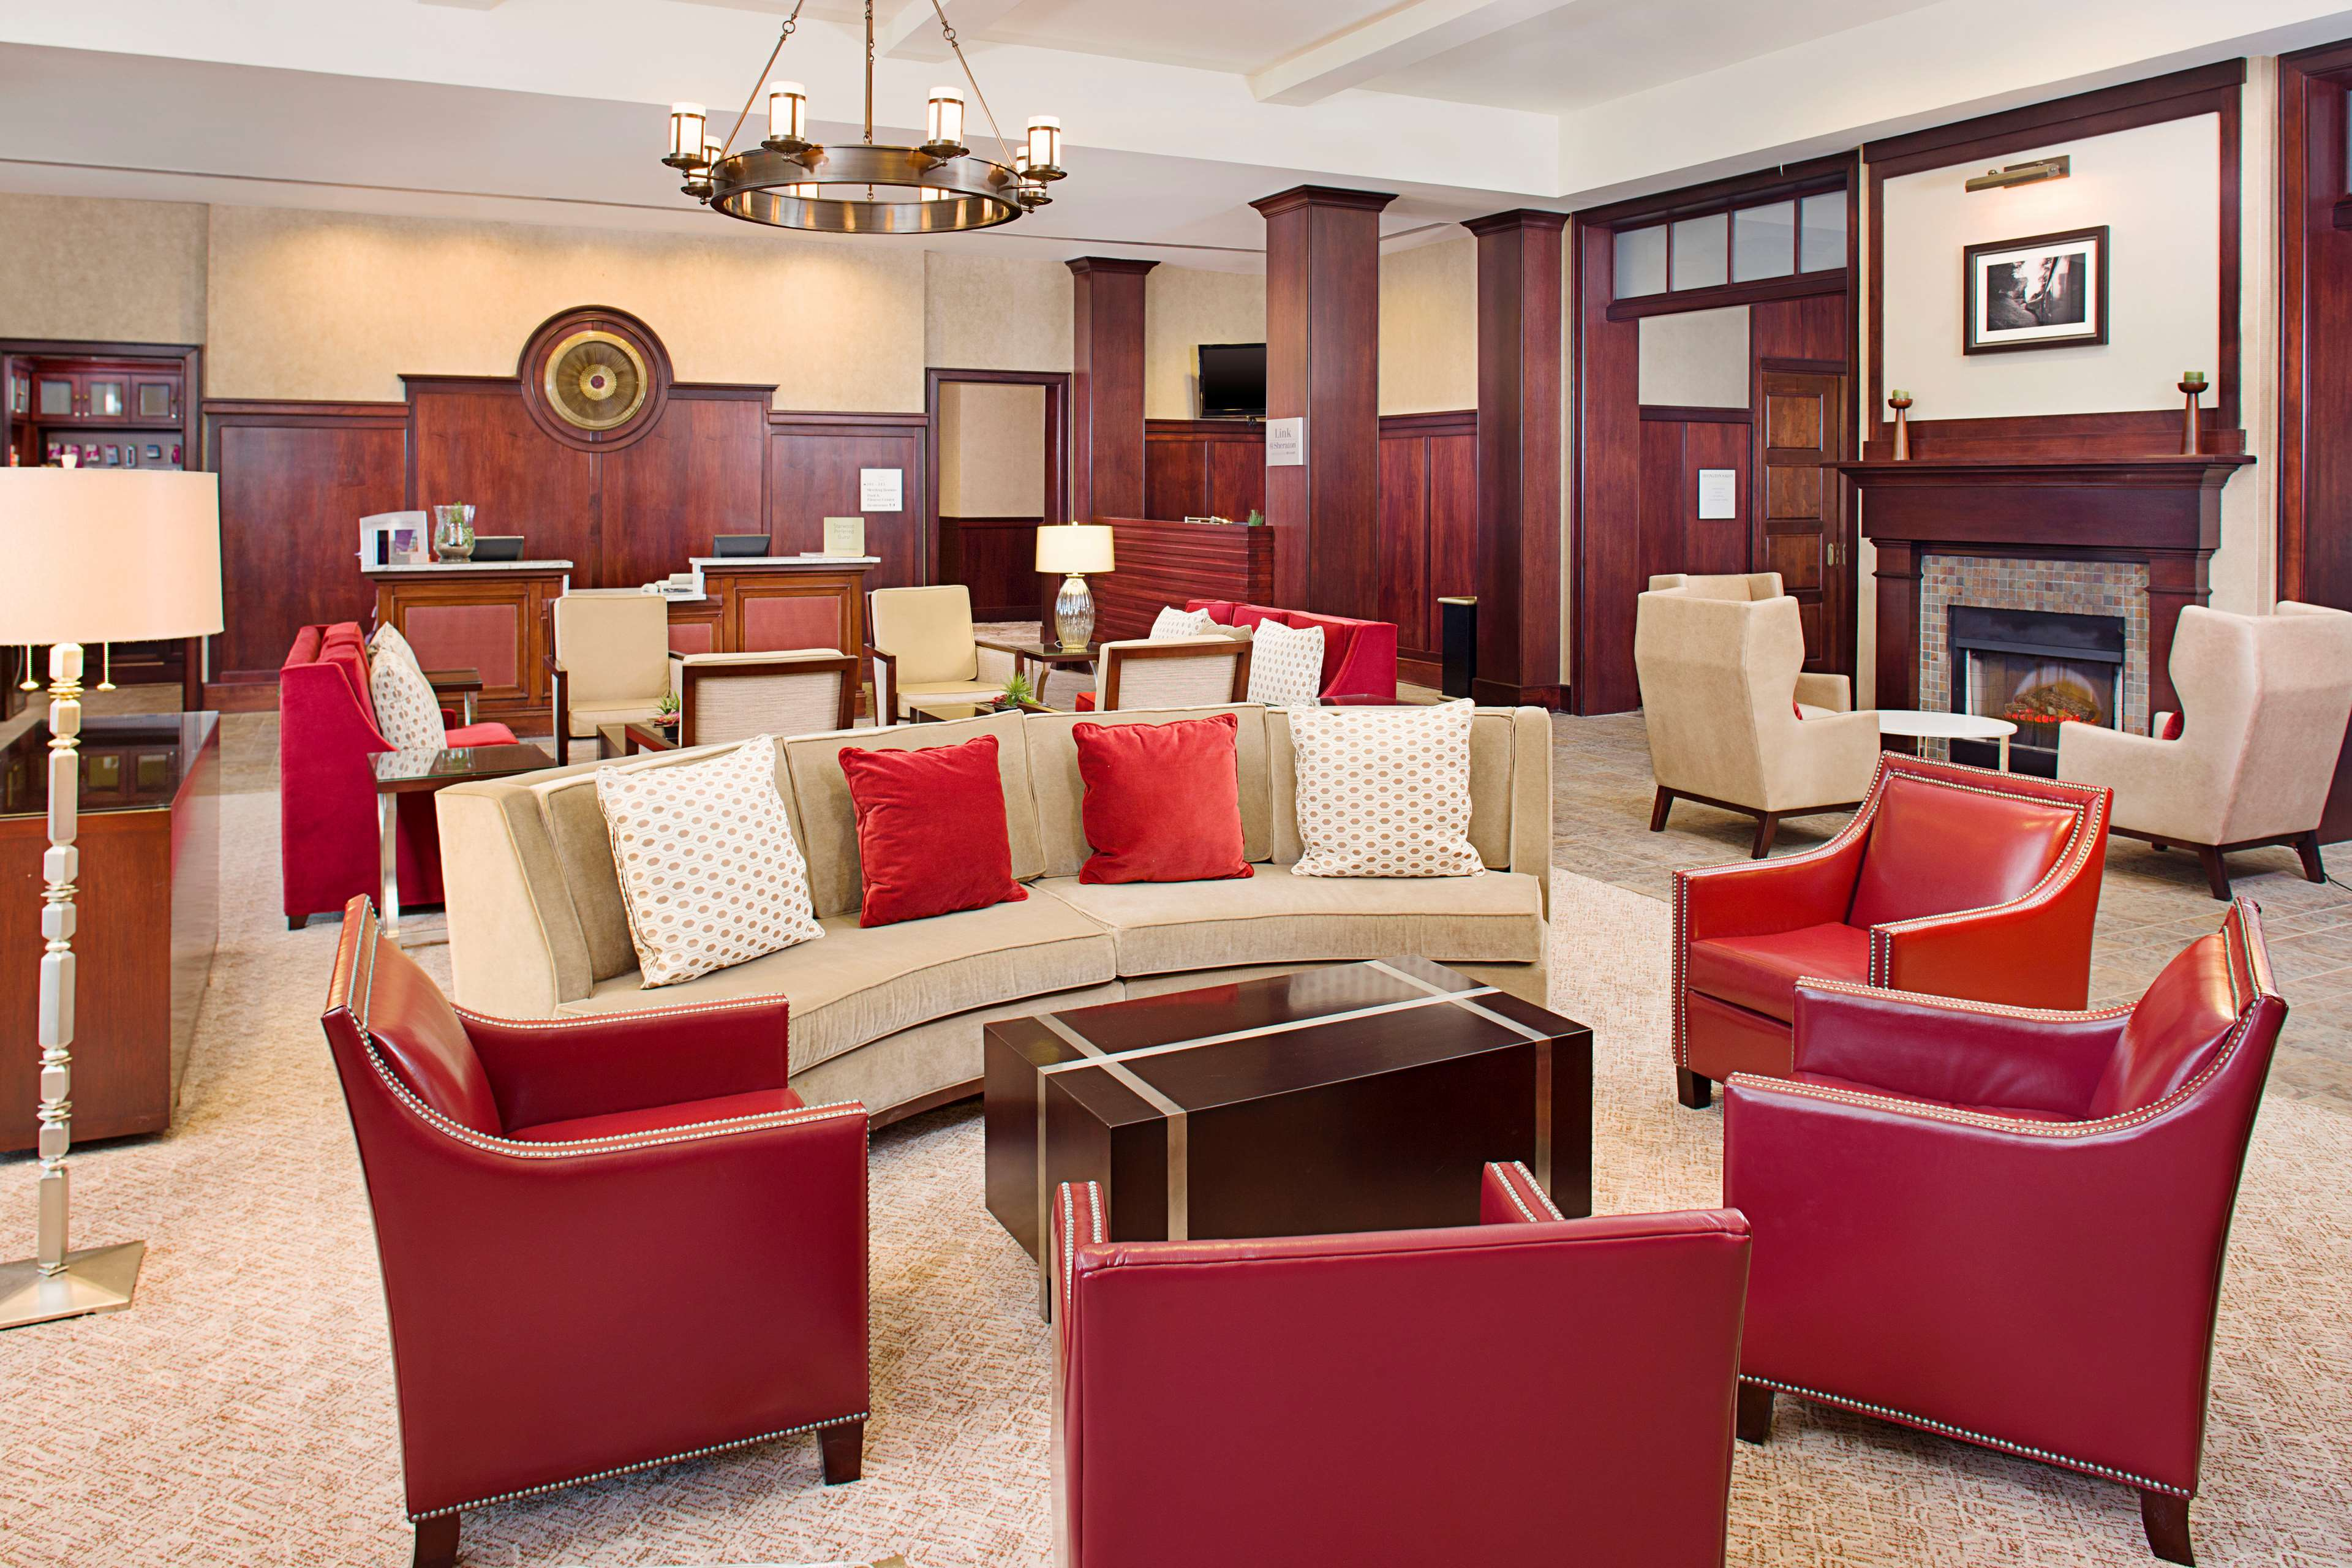 Sheraton Rockville Hotel image 0